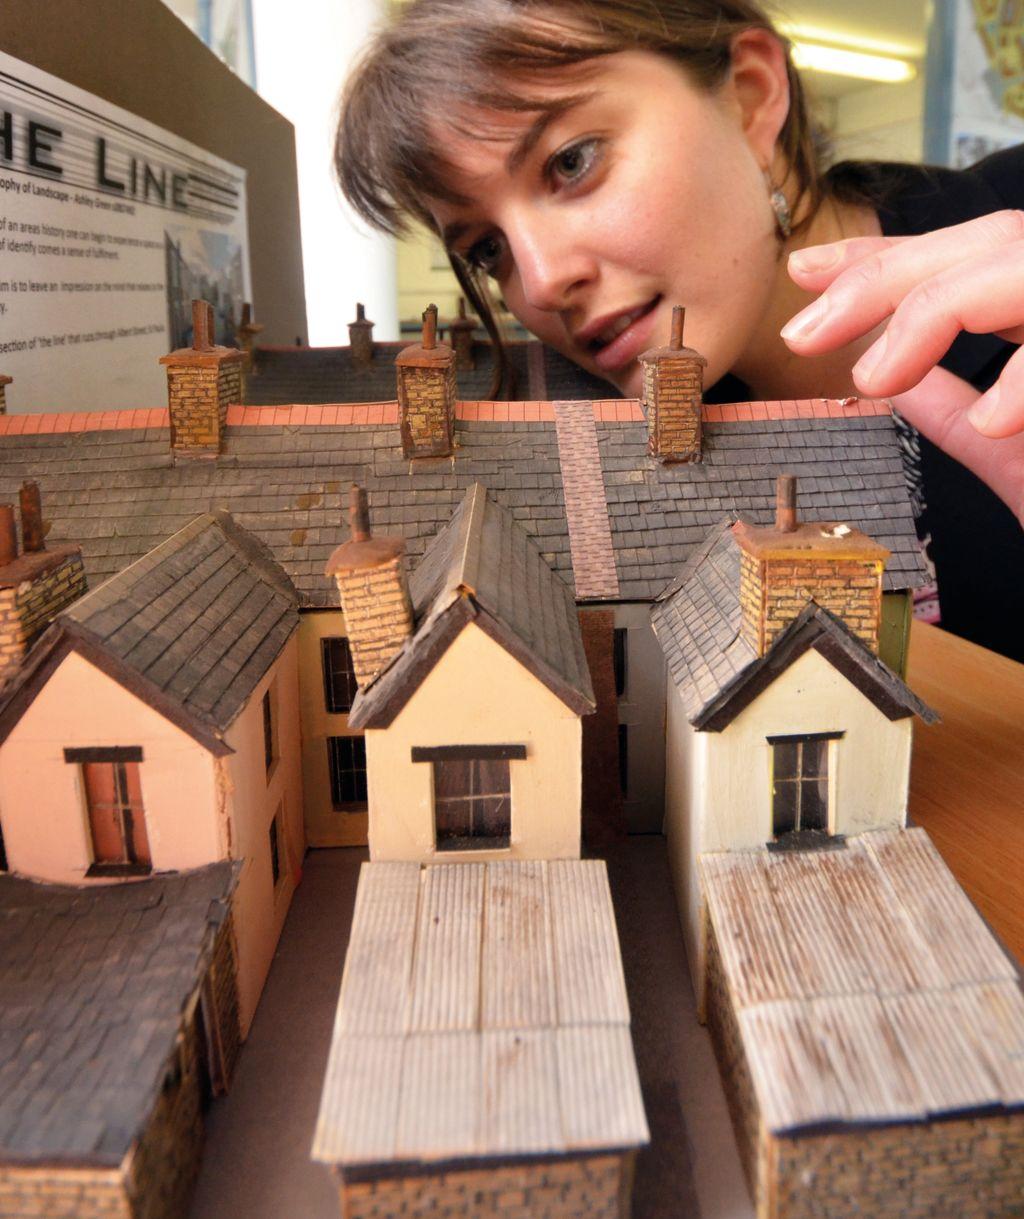 Landscape Architecture student at University of Gloucestershire